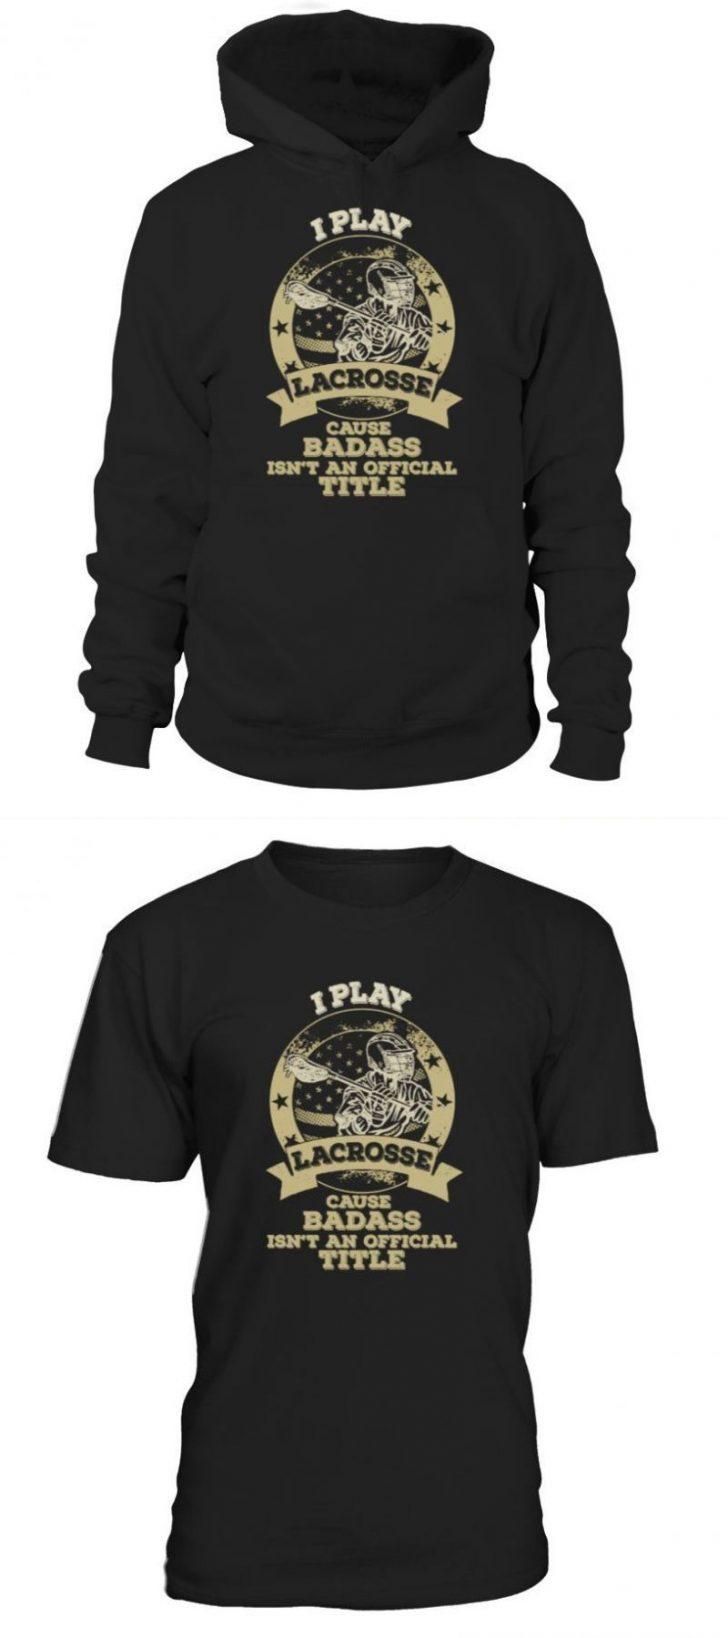 Medium Size of T Shirt Lustige Hundesprüche T Shirts Mit Lustigen Sprüchen Für Kinder Lustige Sprüche T Shirt Männer Lustige Tshirt Sprüche Für Frauen Küche T Shirt Lustige Sprüche